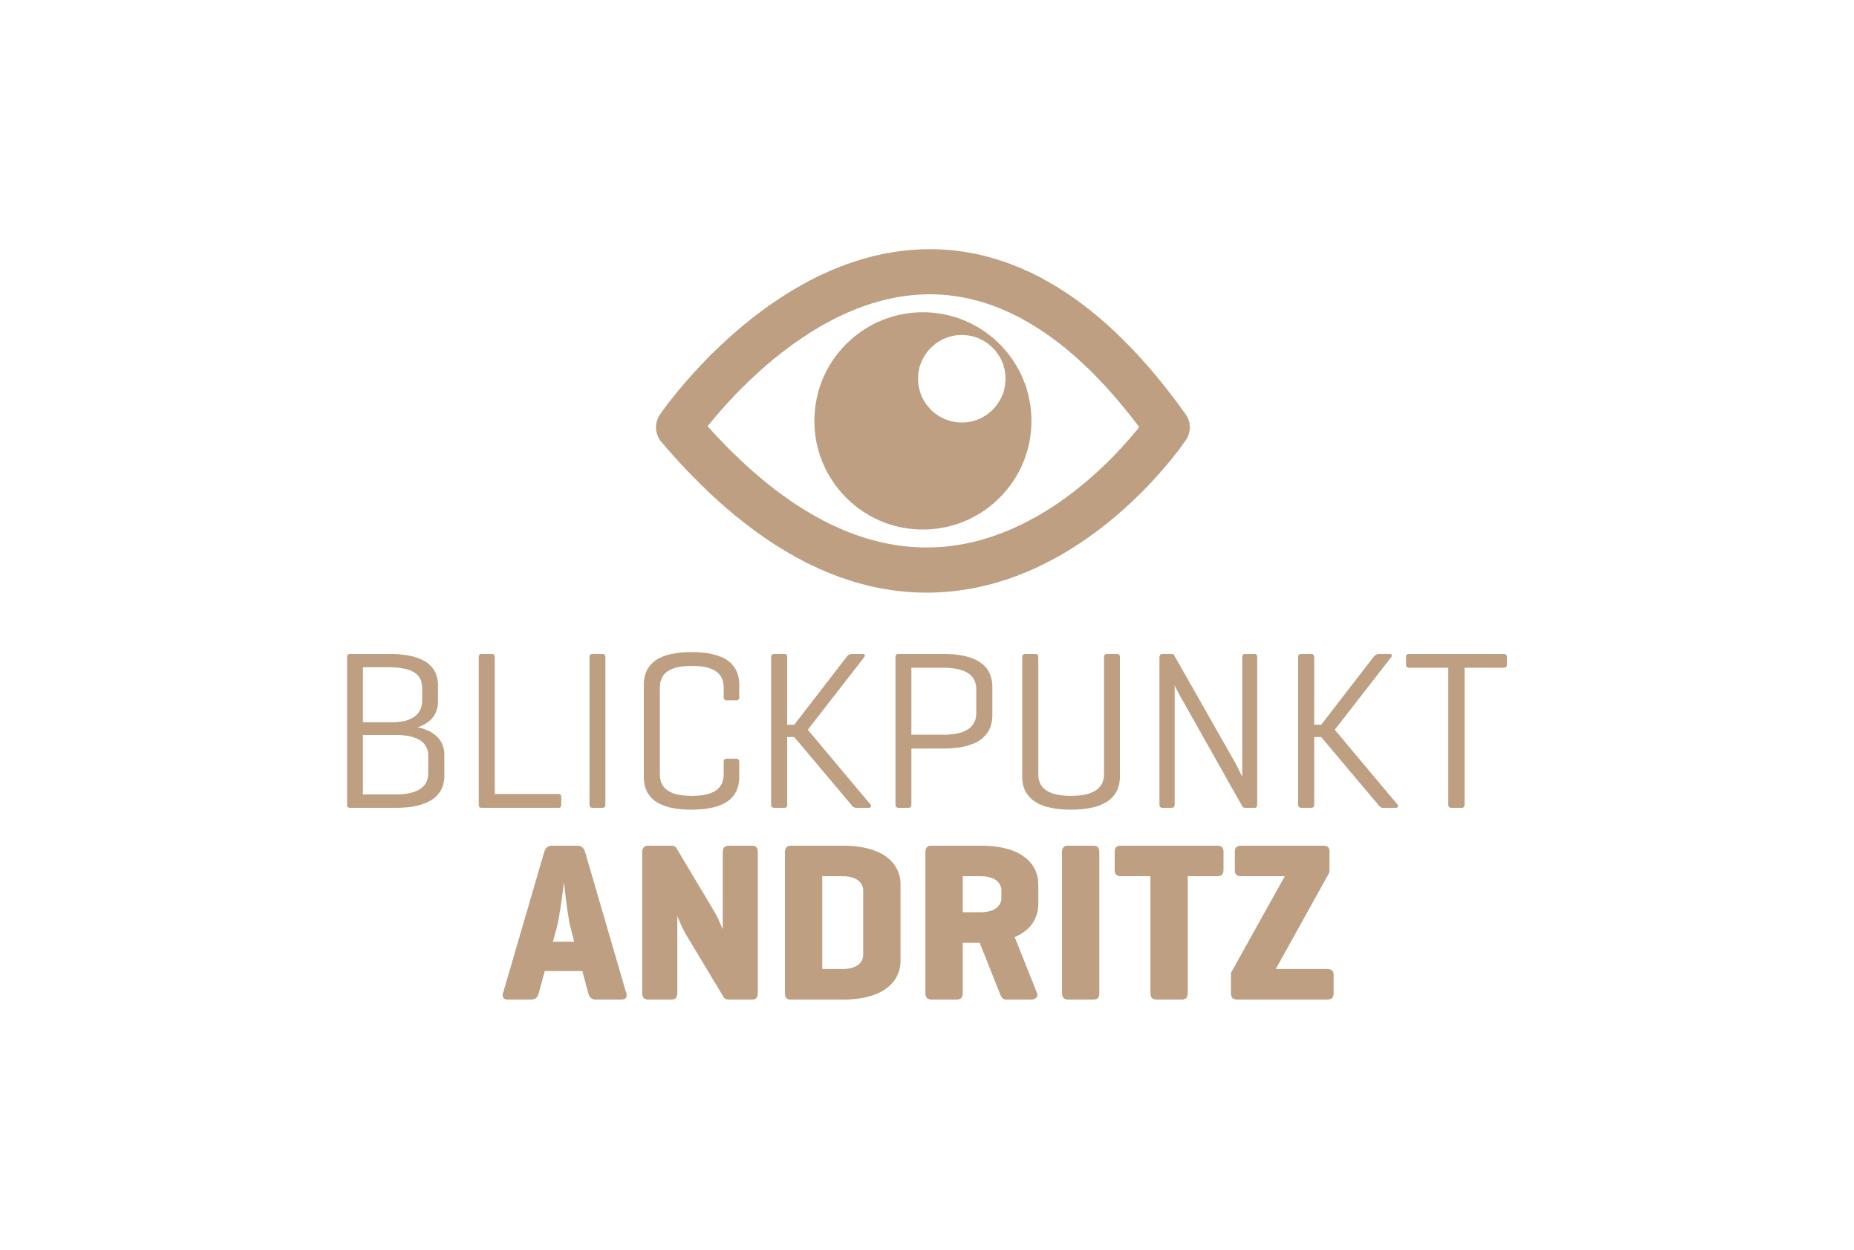 Blickpunkt Andritz